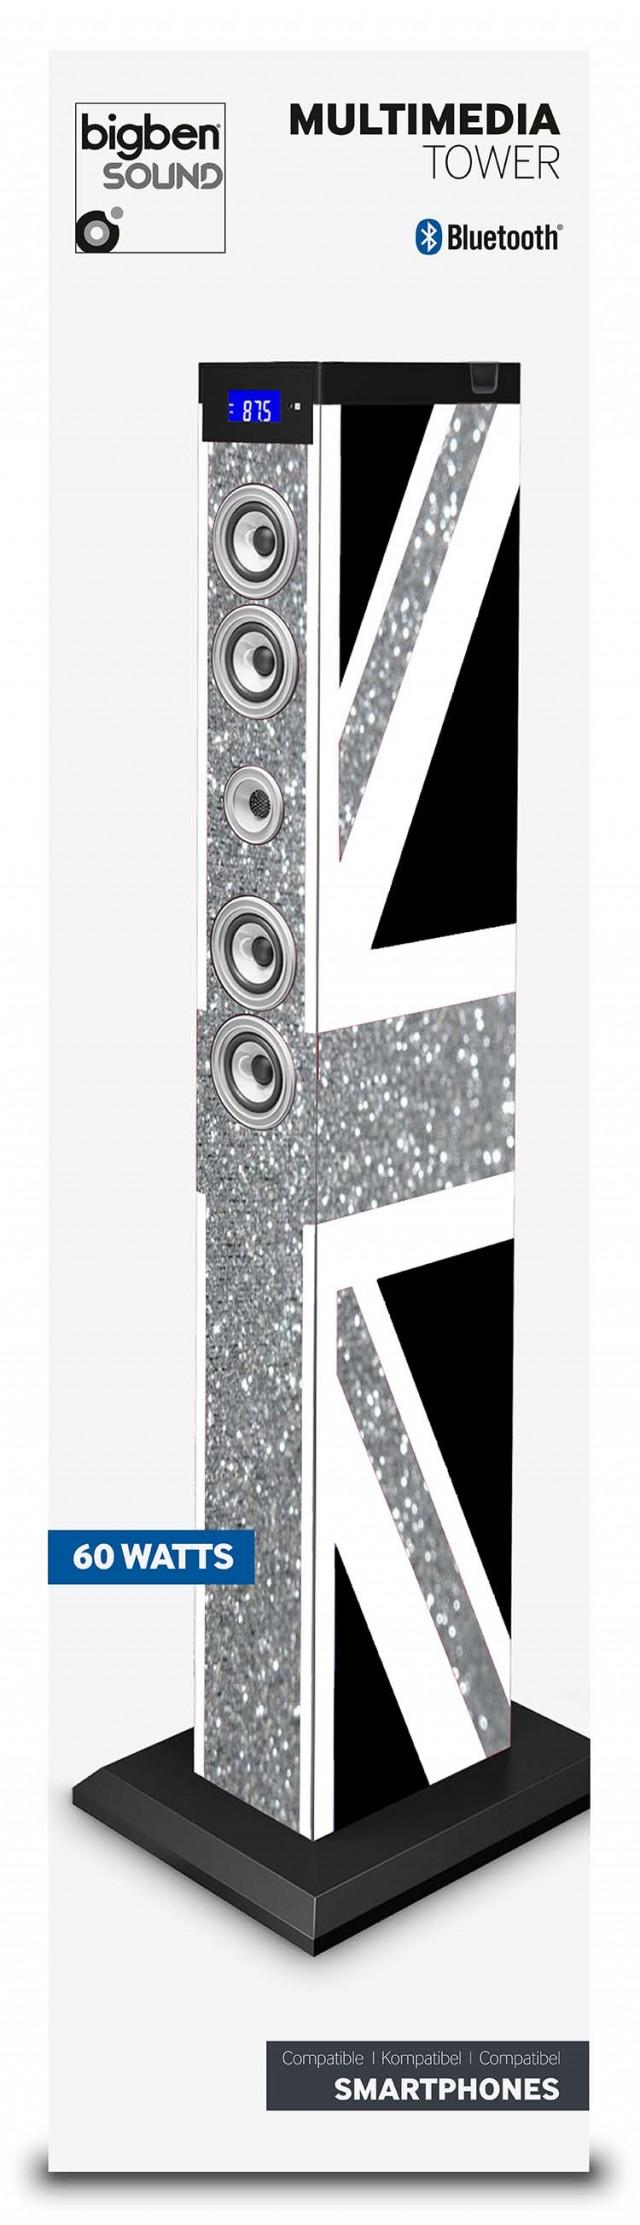 Sound Tower TW9 – Union Jack Glitter - Packshot